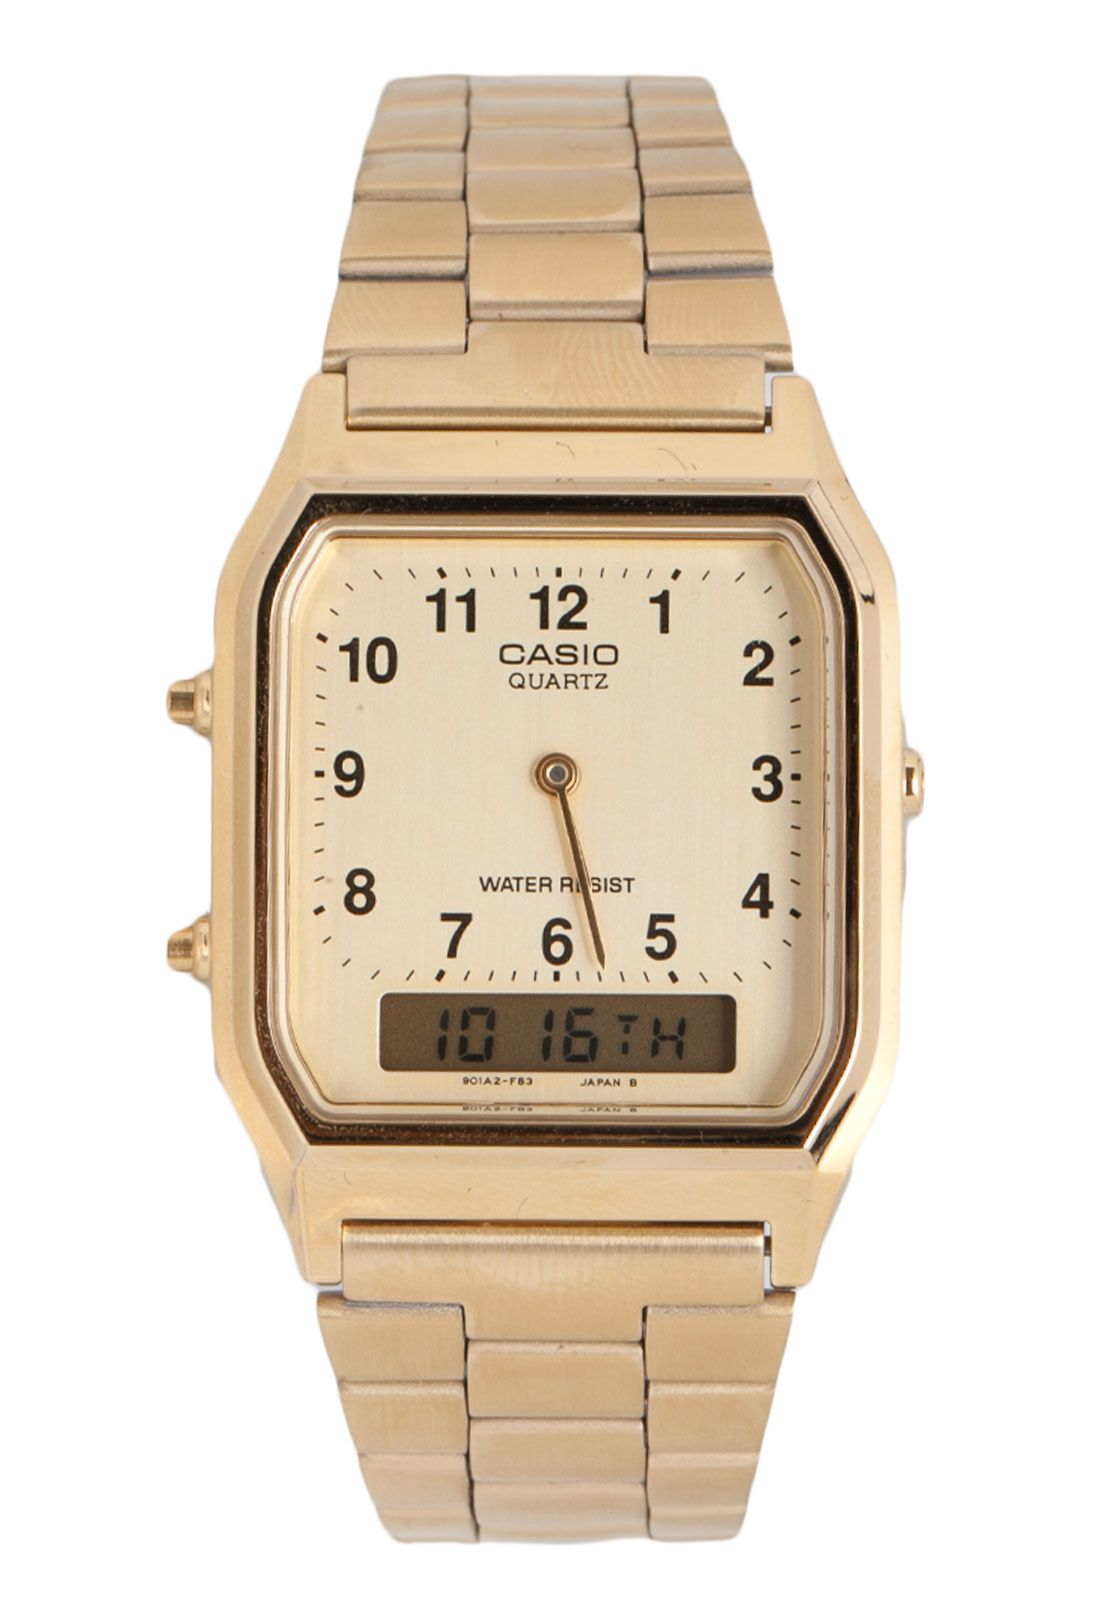 63f3ac9ae94c8 Relógio Casio AQ-230GA-9BMQ Dourado   acessórios.   Relógio casio ...